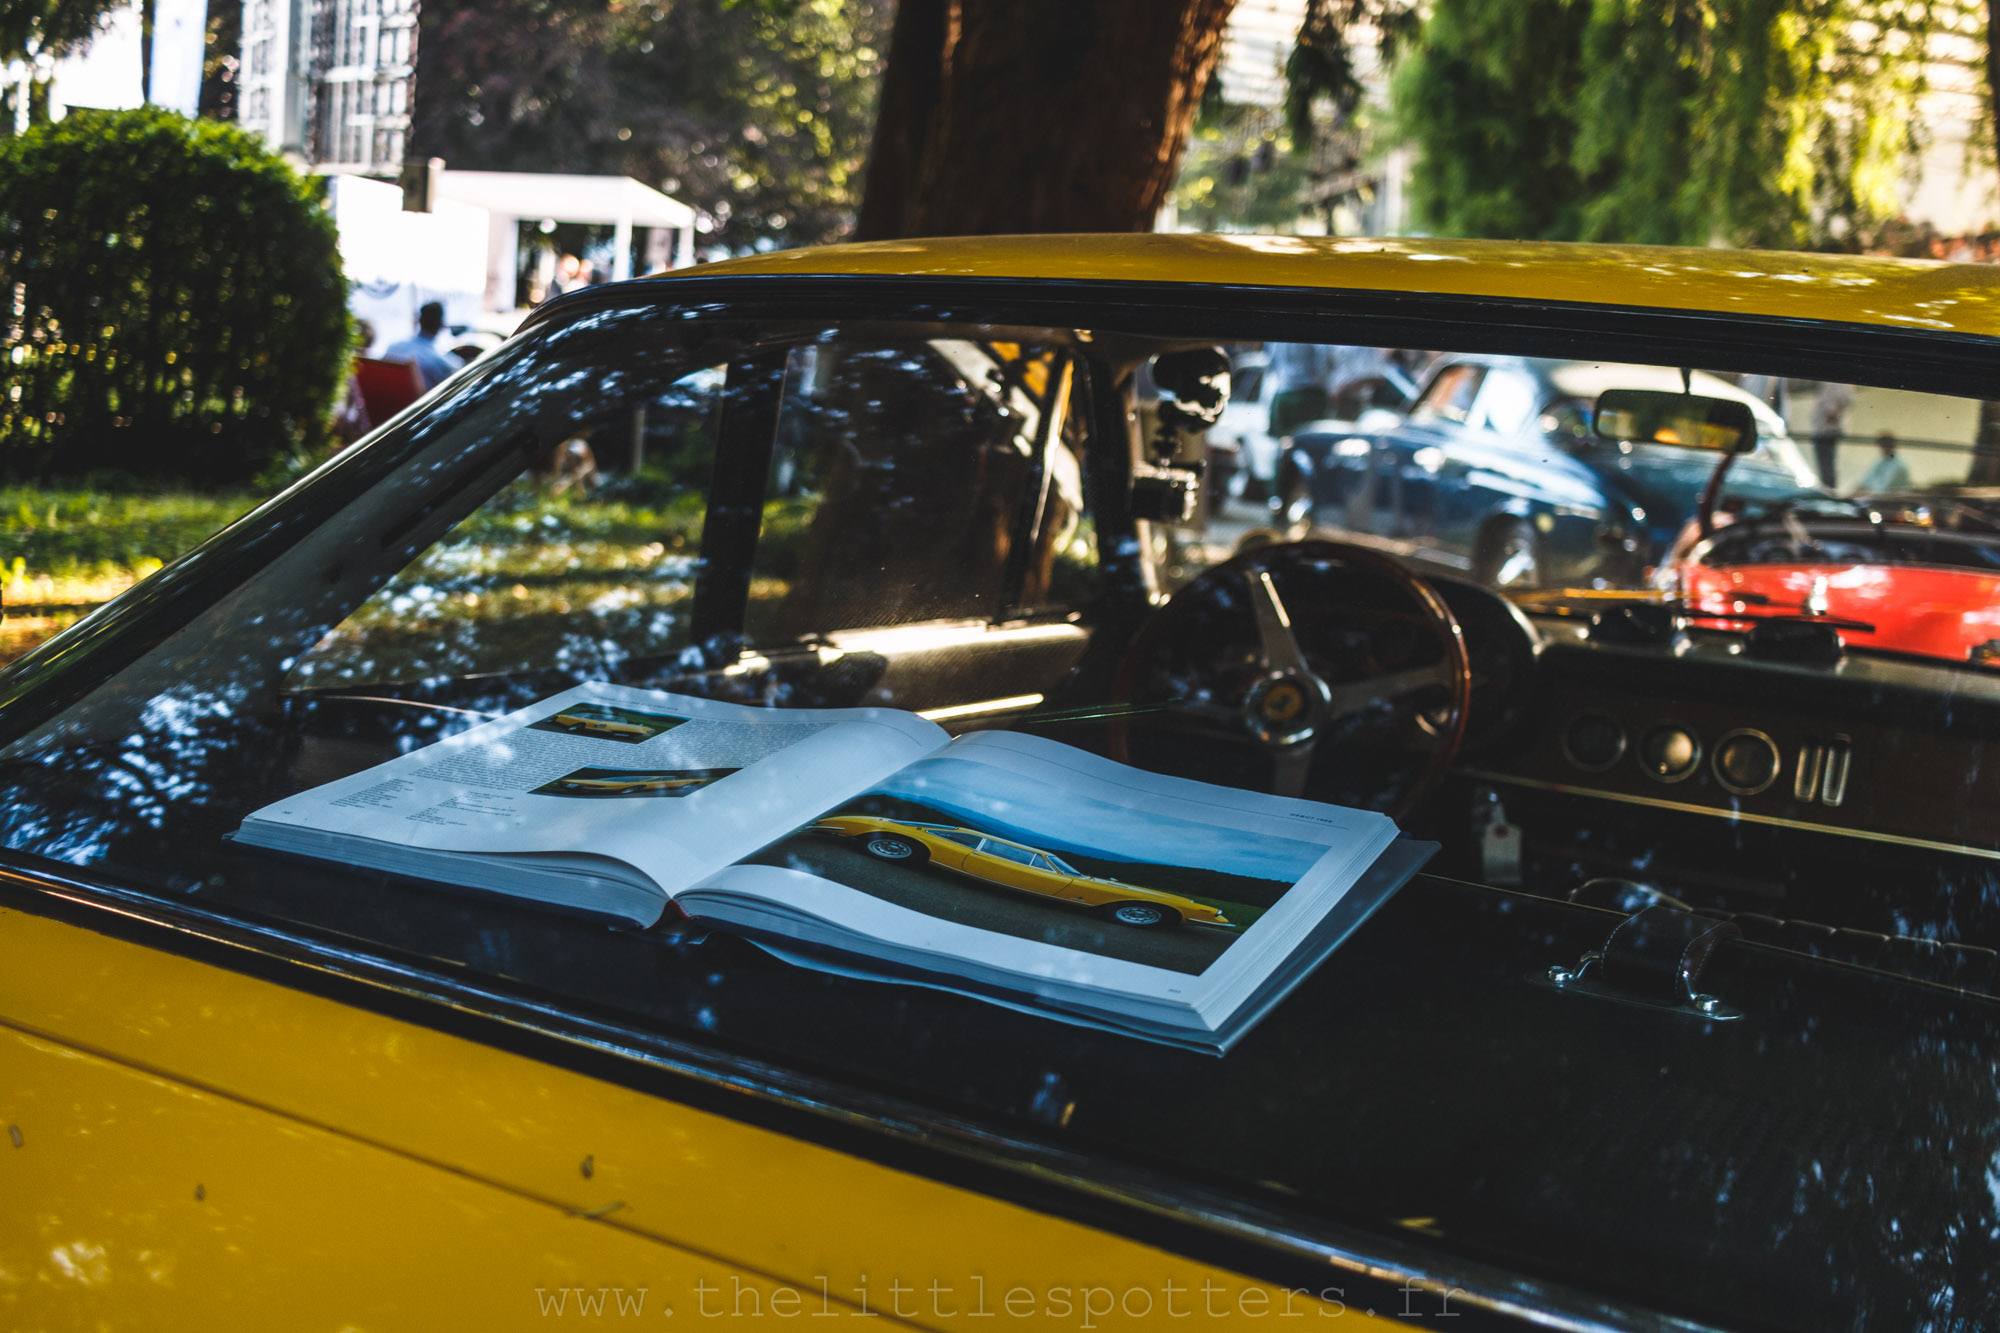 Ferrari 365 GTC, vendue 582 400 euros.